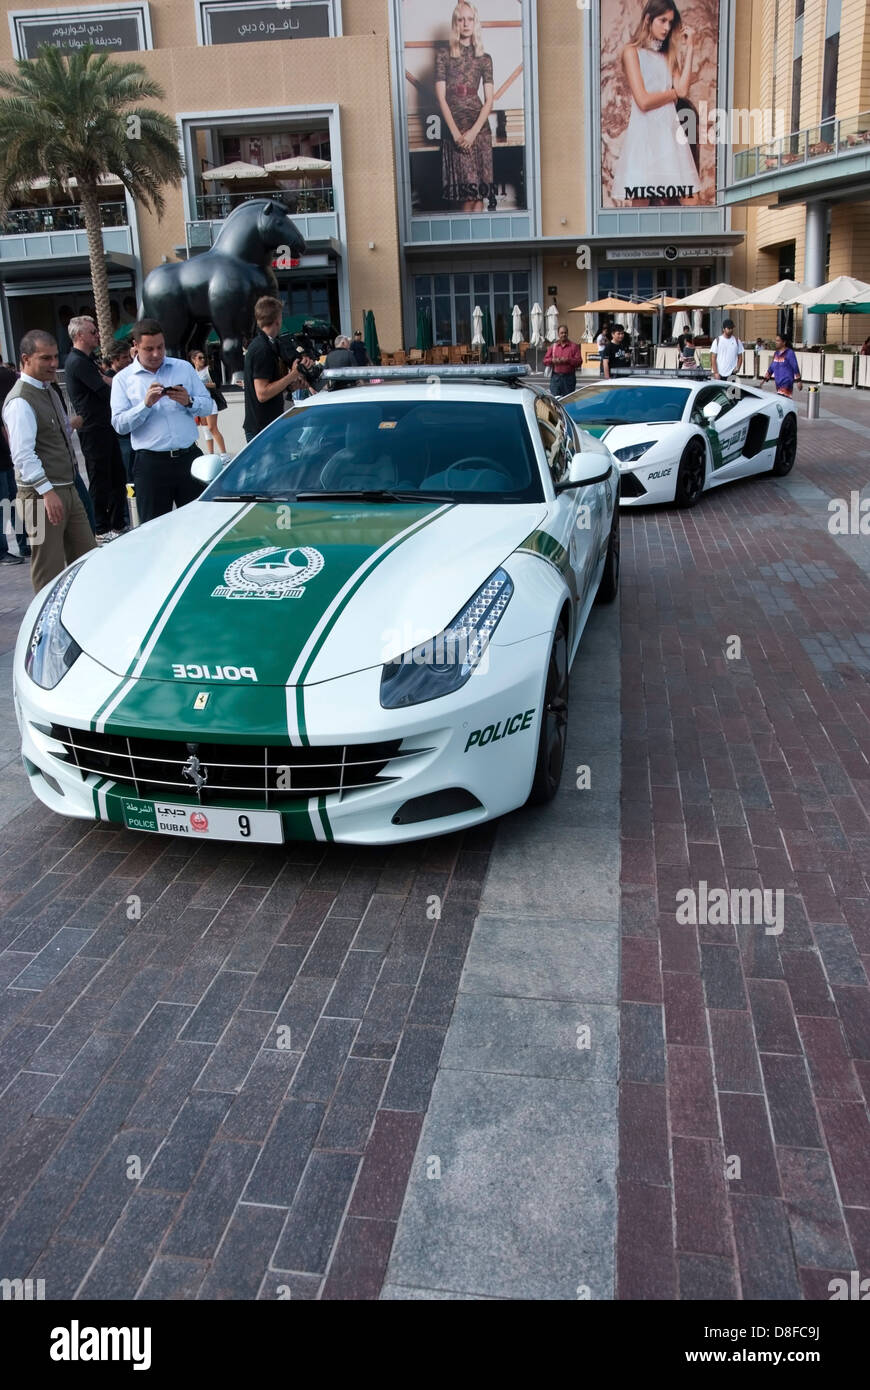 Dubai Police Ferrari FF Lamborghini Patrol Cars Stock Photo